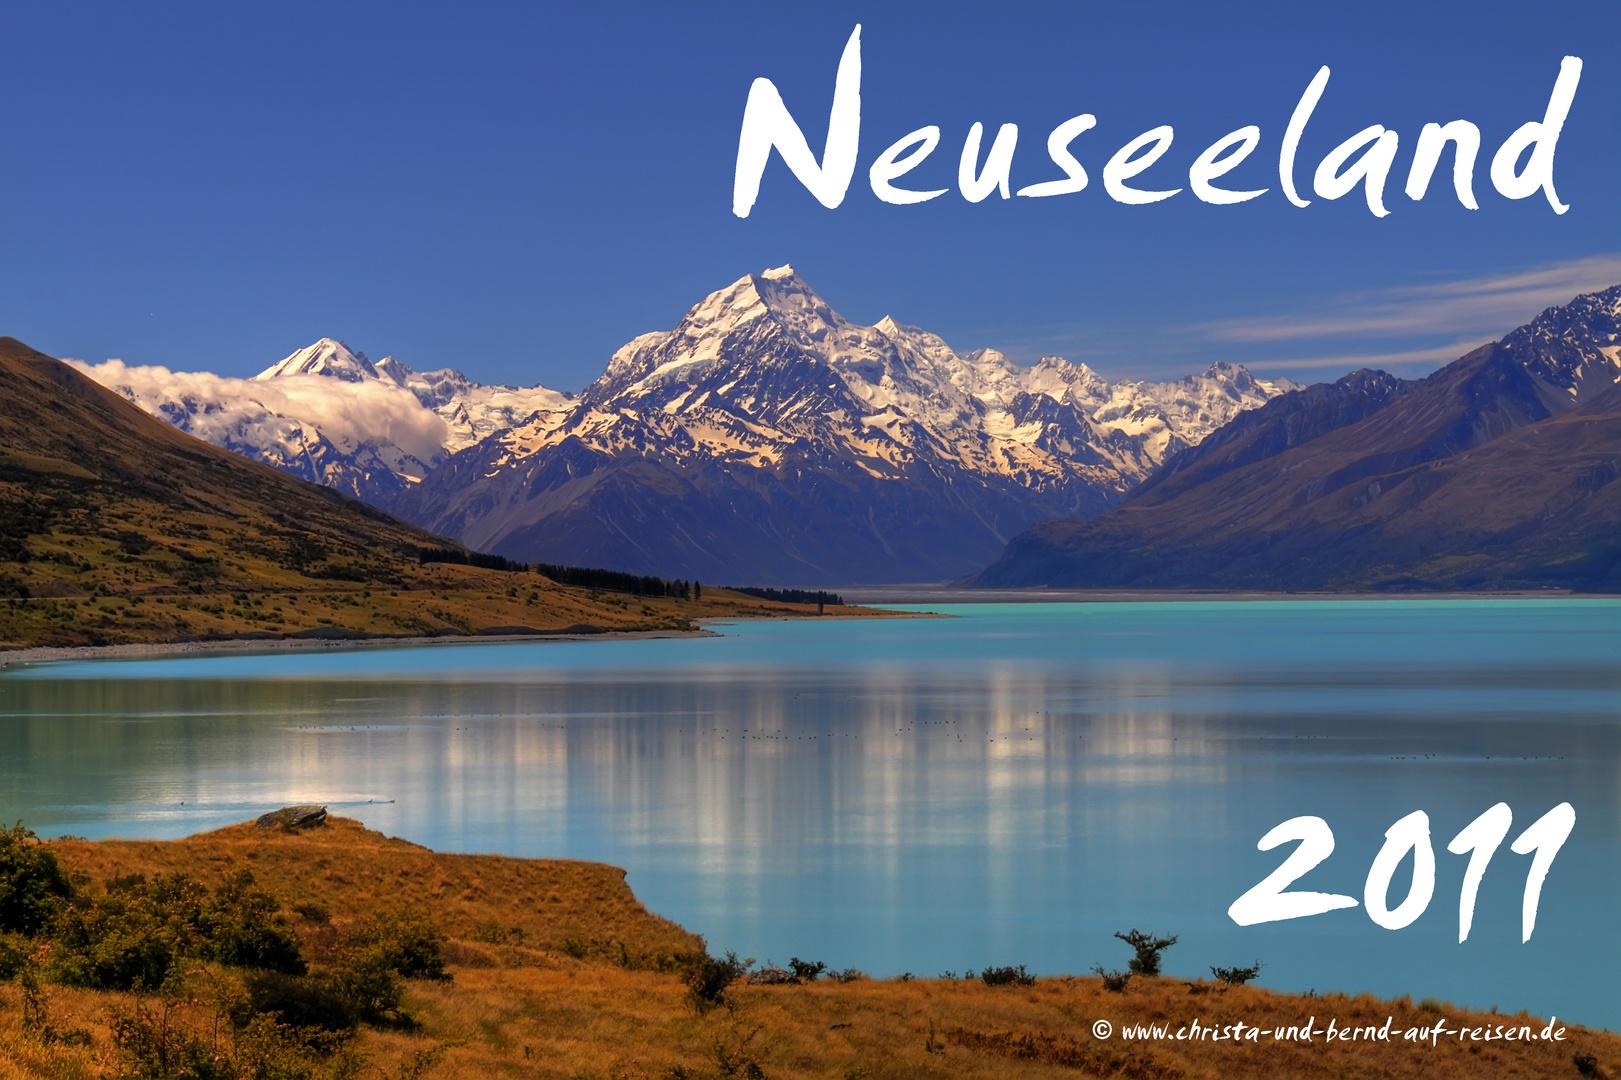 Neuseeland als Kalender 2011 (1)